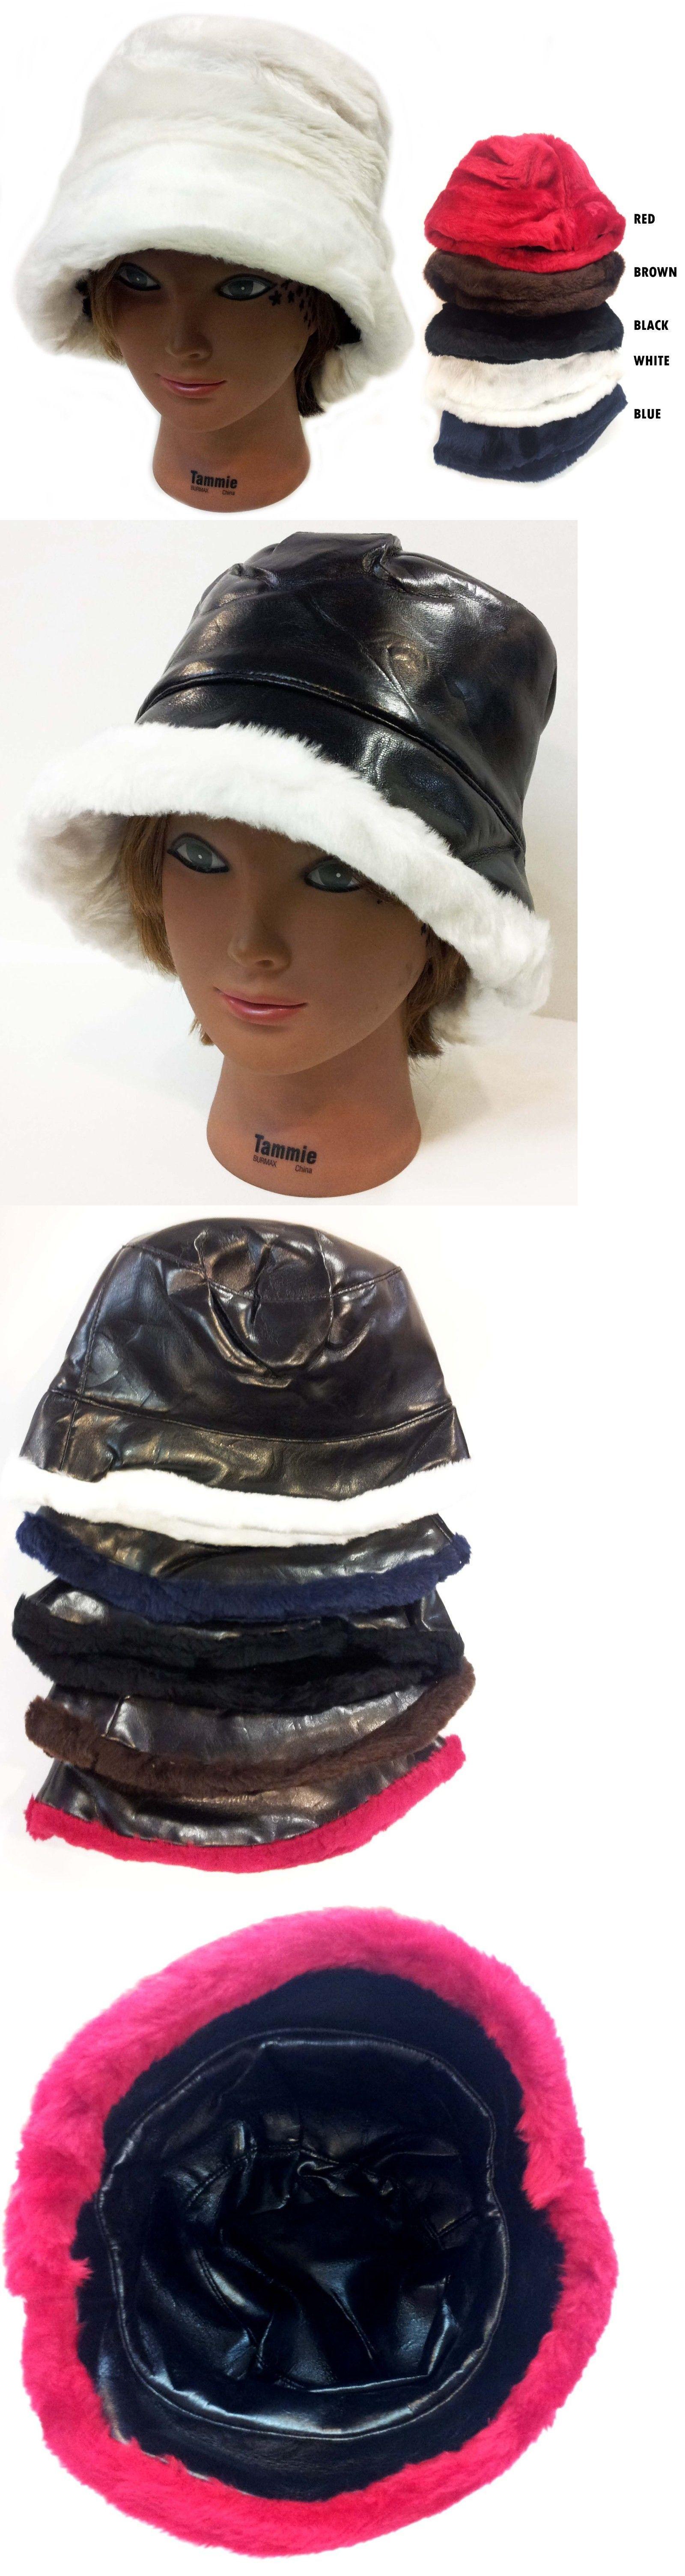 df30eccebd66eb Hats 45230: Lady Women Men Russian Cossack Style Reversible Faux Fur Hat -  5 Colors -> BUY IT NOW ONLY: $12.24 on #eBay #women #russian #cossack  #style ...